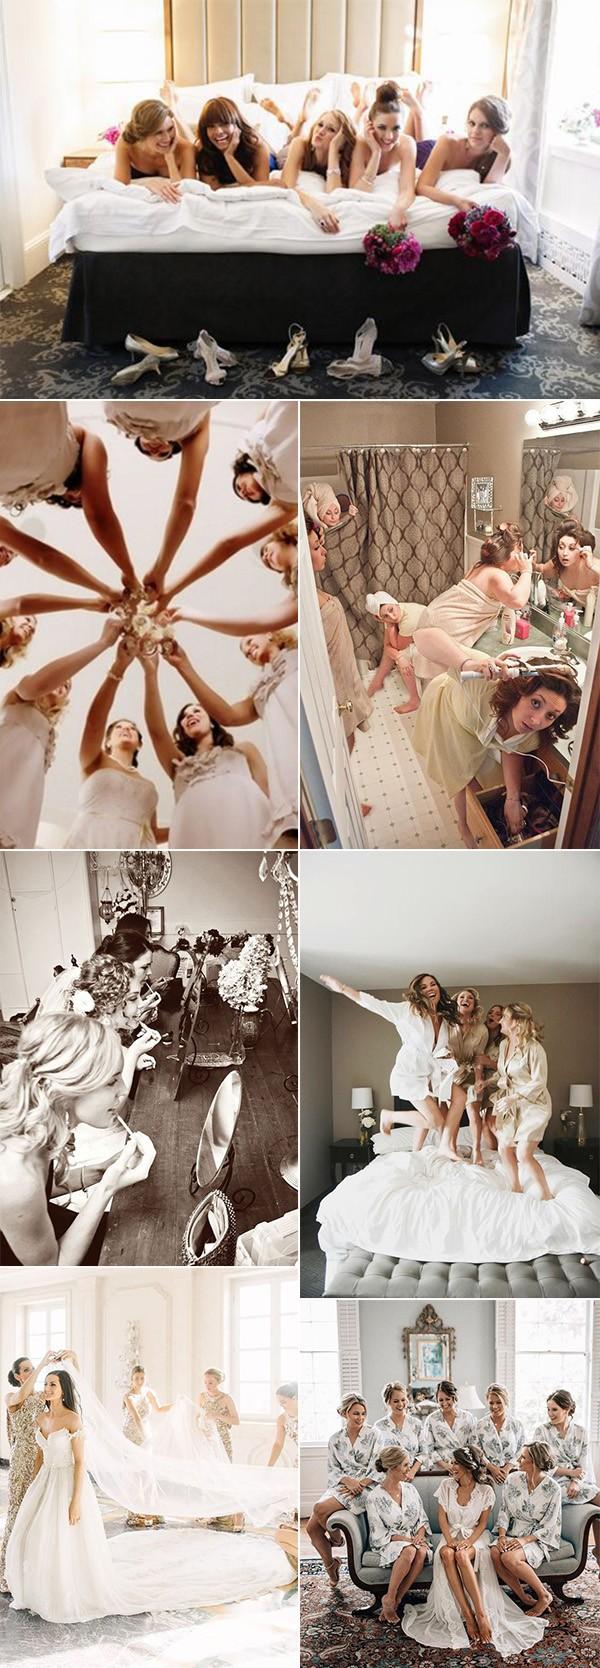 wedding photo pose ideas with bridesmaids